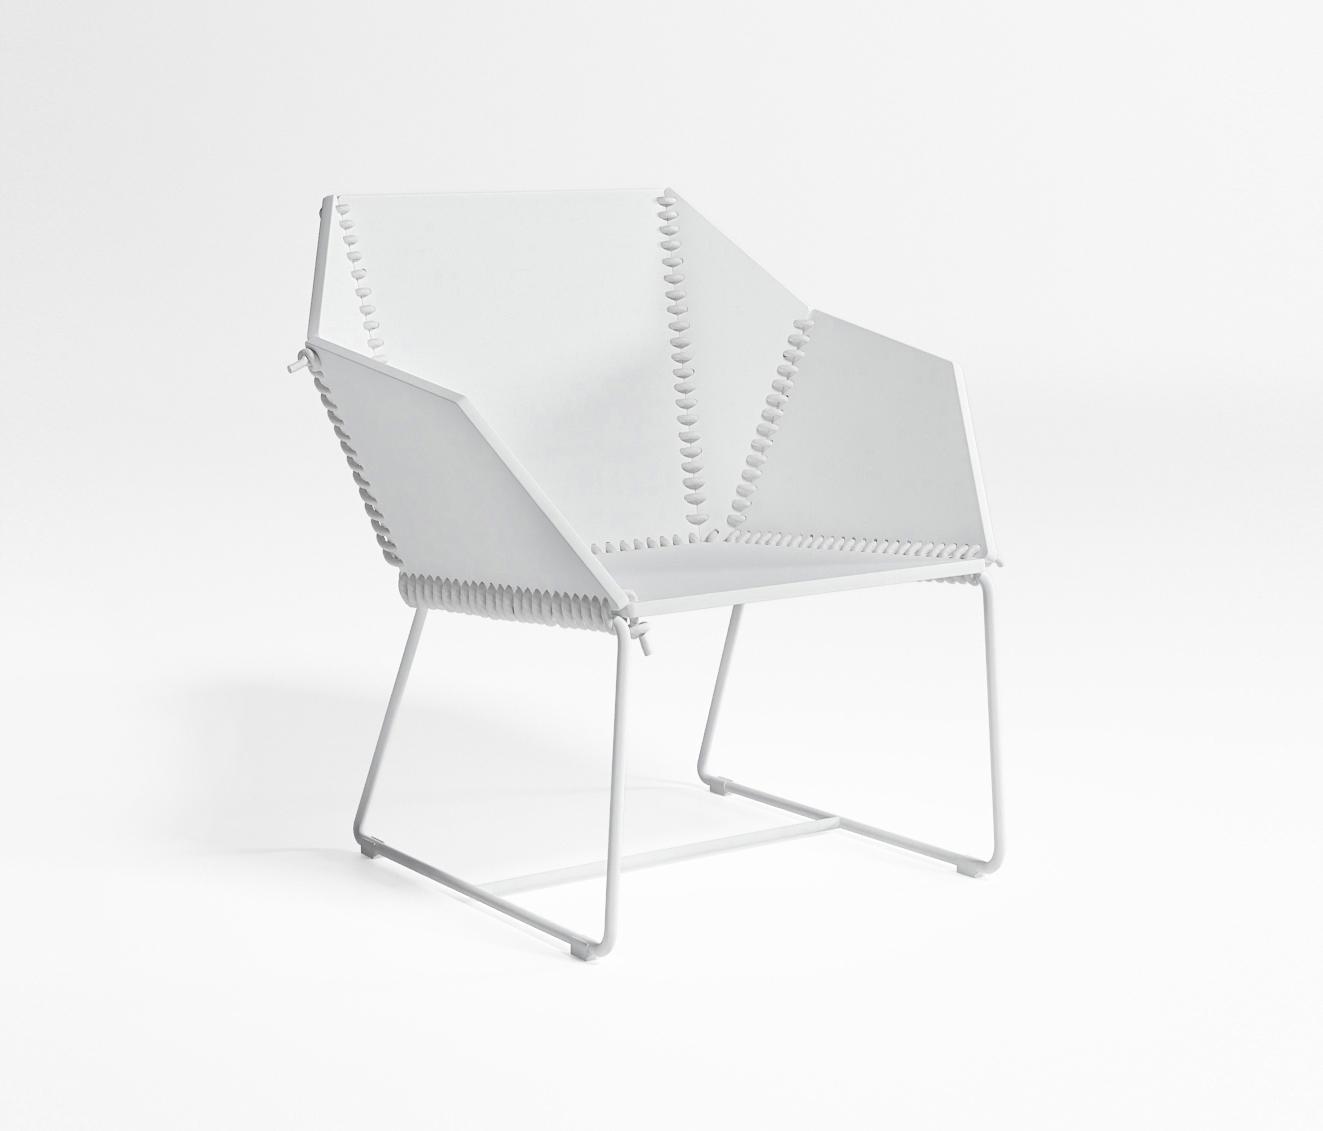 gandia blasco clack chair exercises for seniors textile armchair armchairs from gandiablasco architonic by